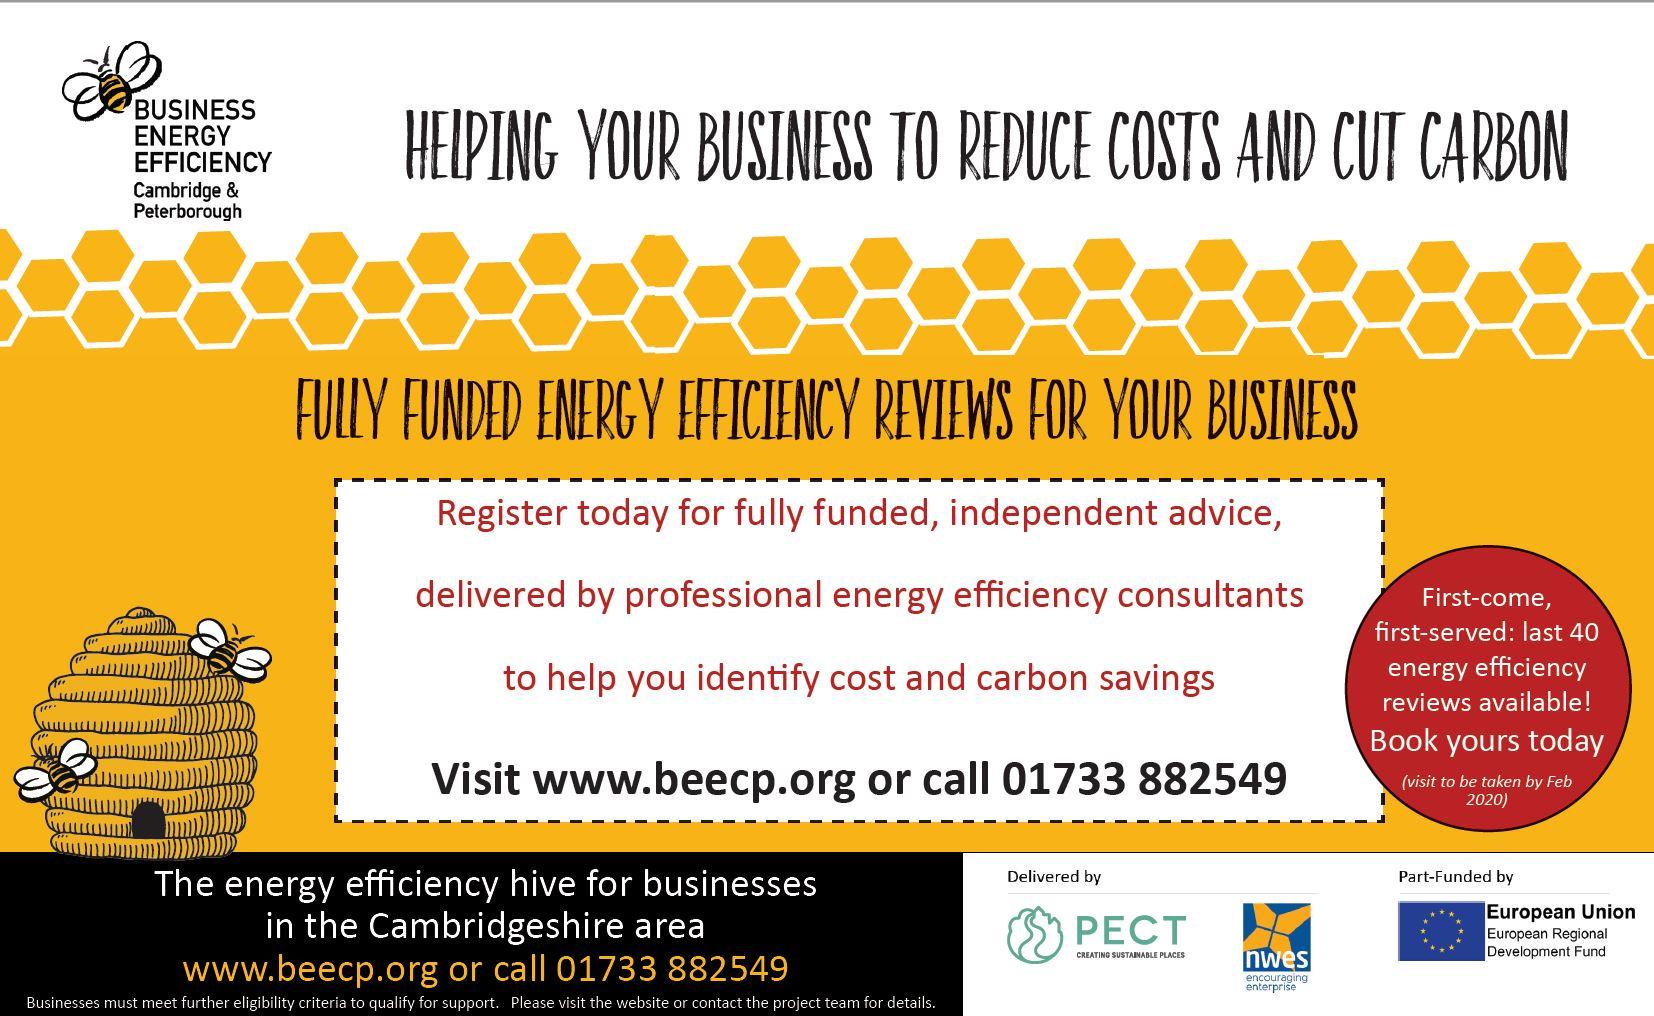 Cambridgeshire businesses cut carbon and save money